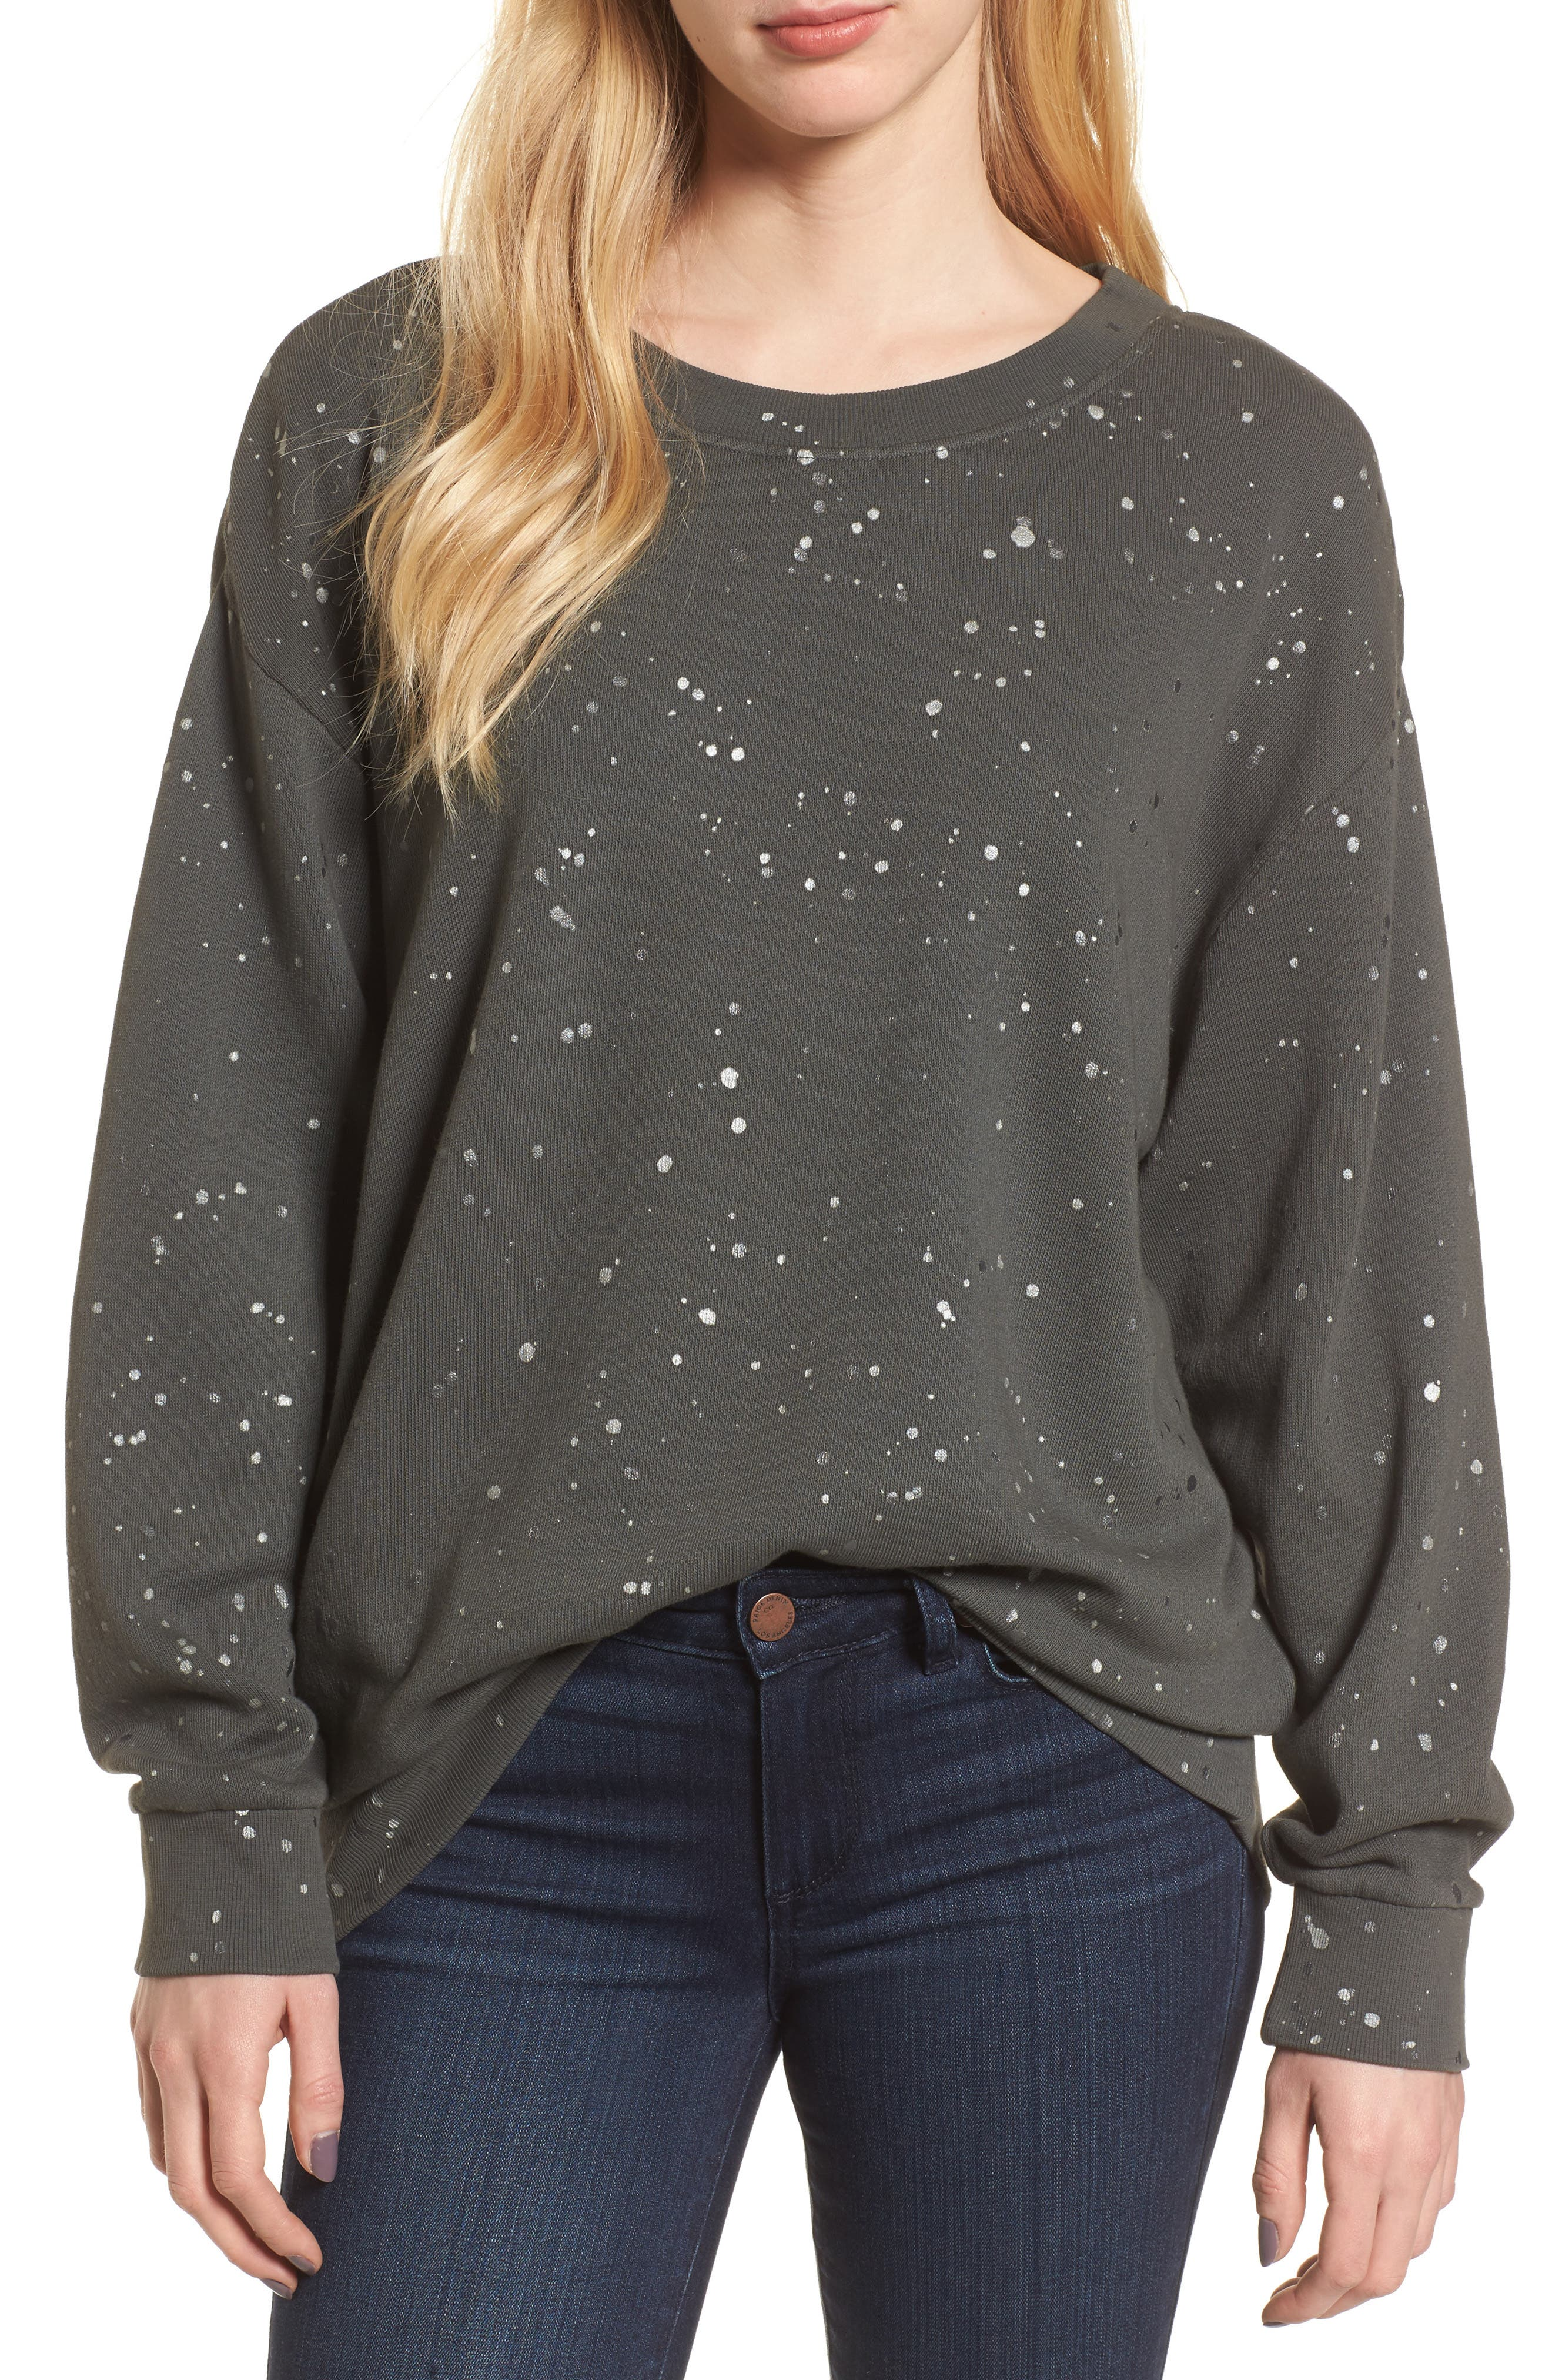 Alternate Image 1 Selected - Splendid Graphic Sweatshirt